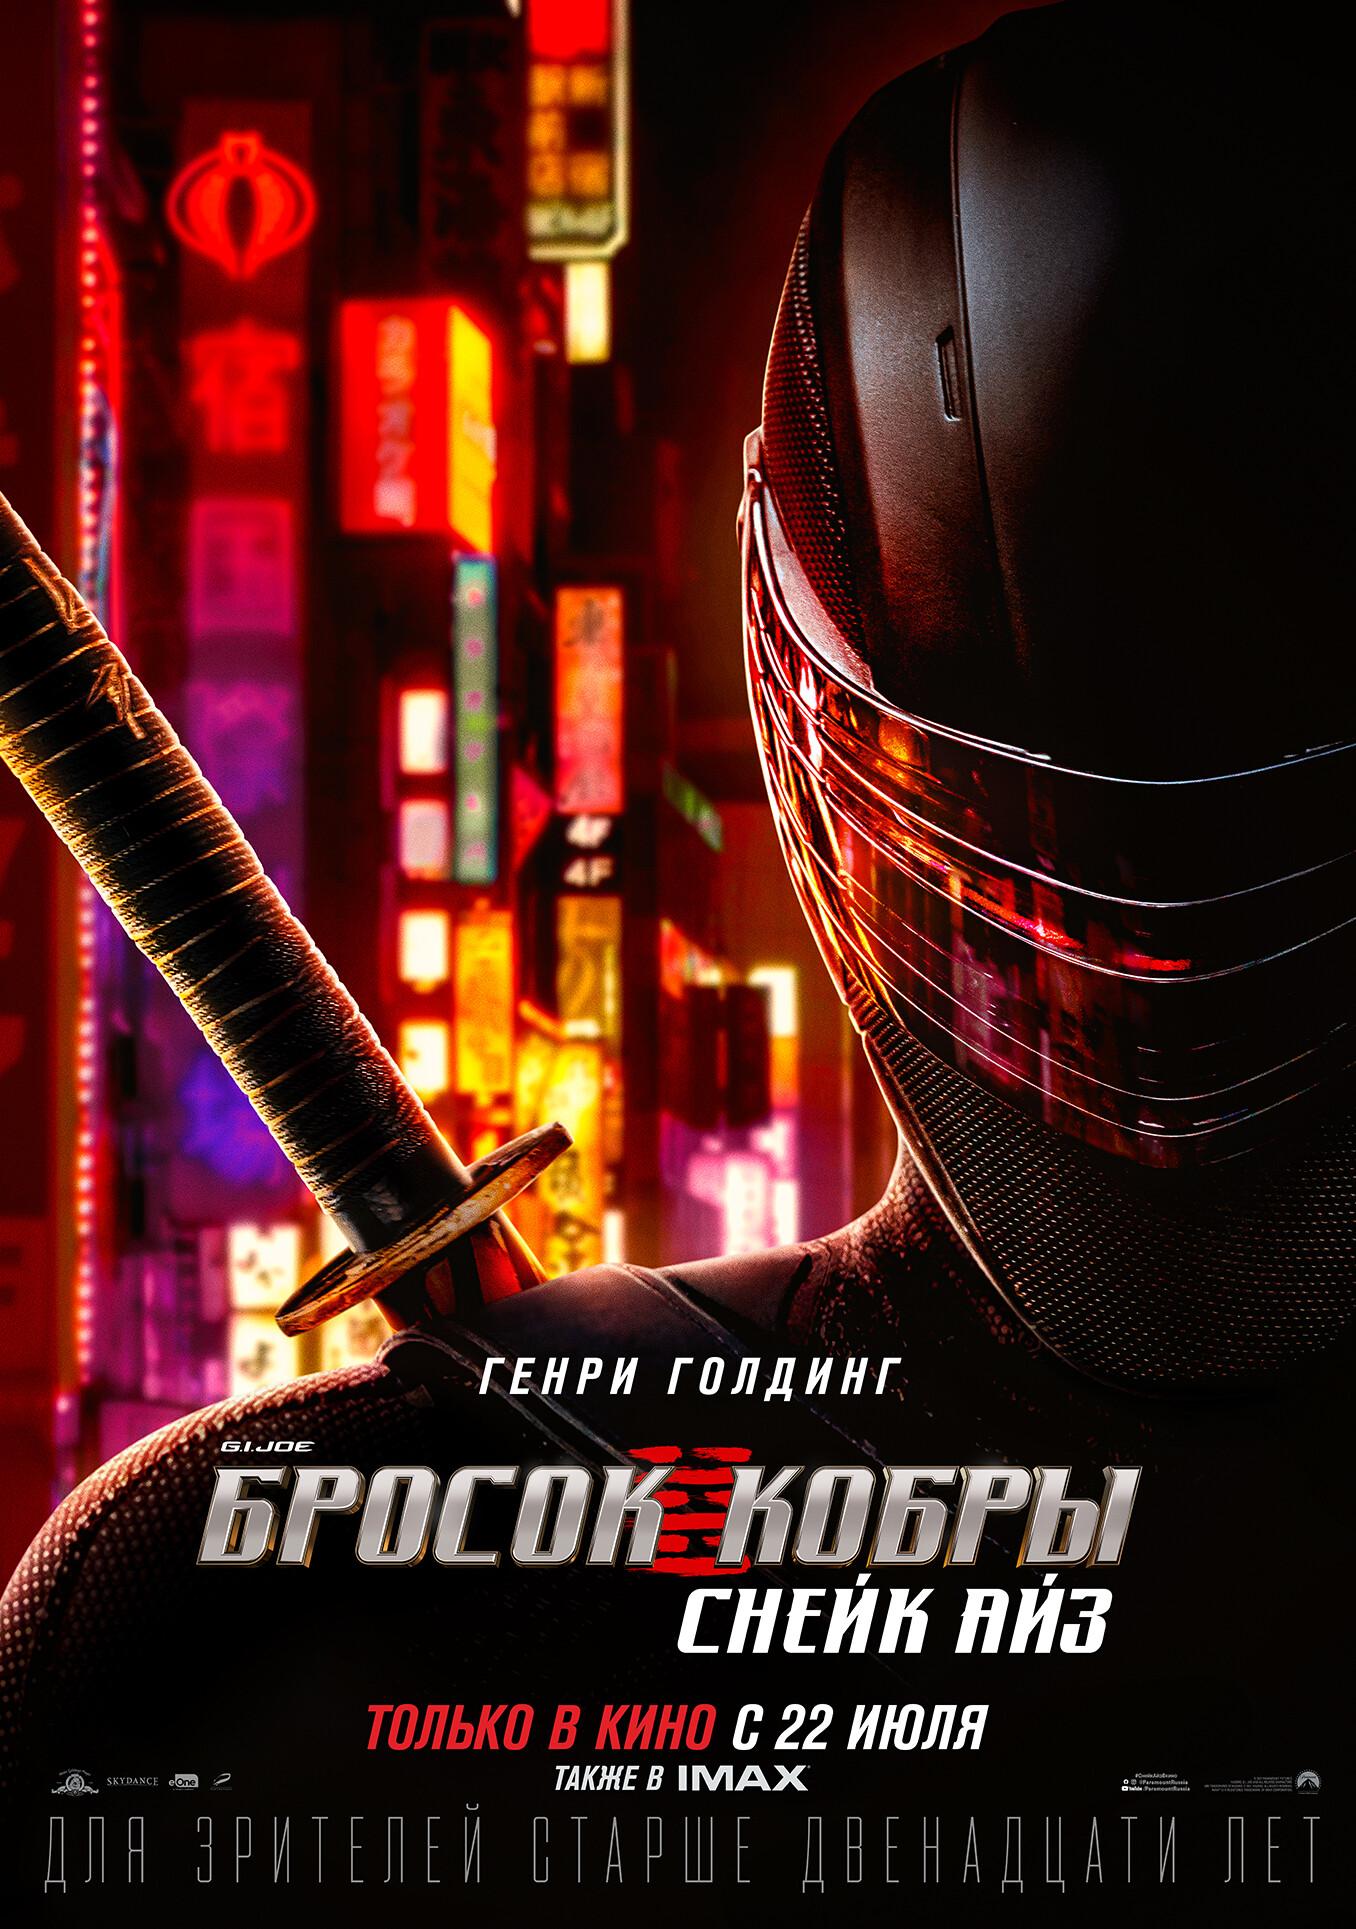 G. I. Joe. Бросок кобры: Снейк Айз, постер № 14